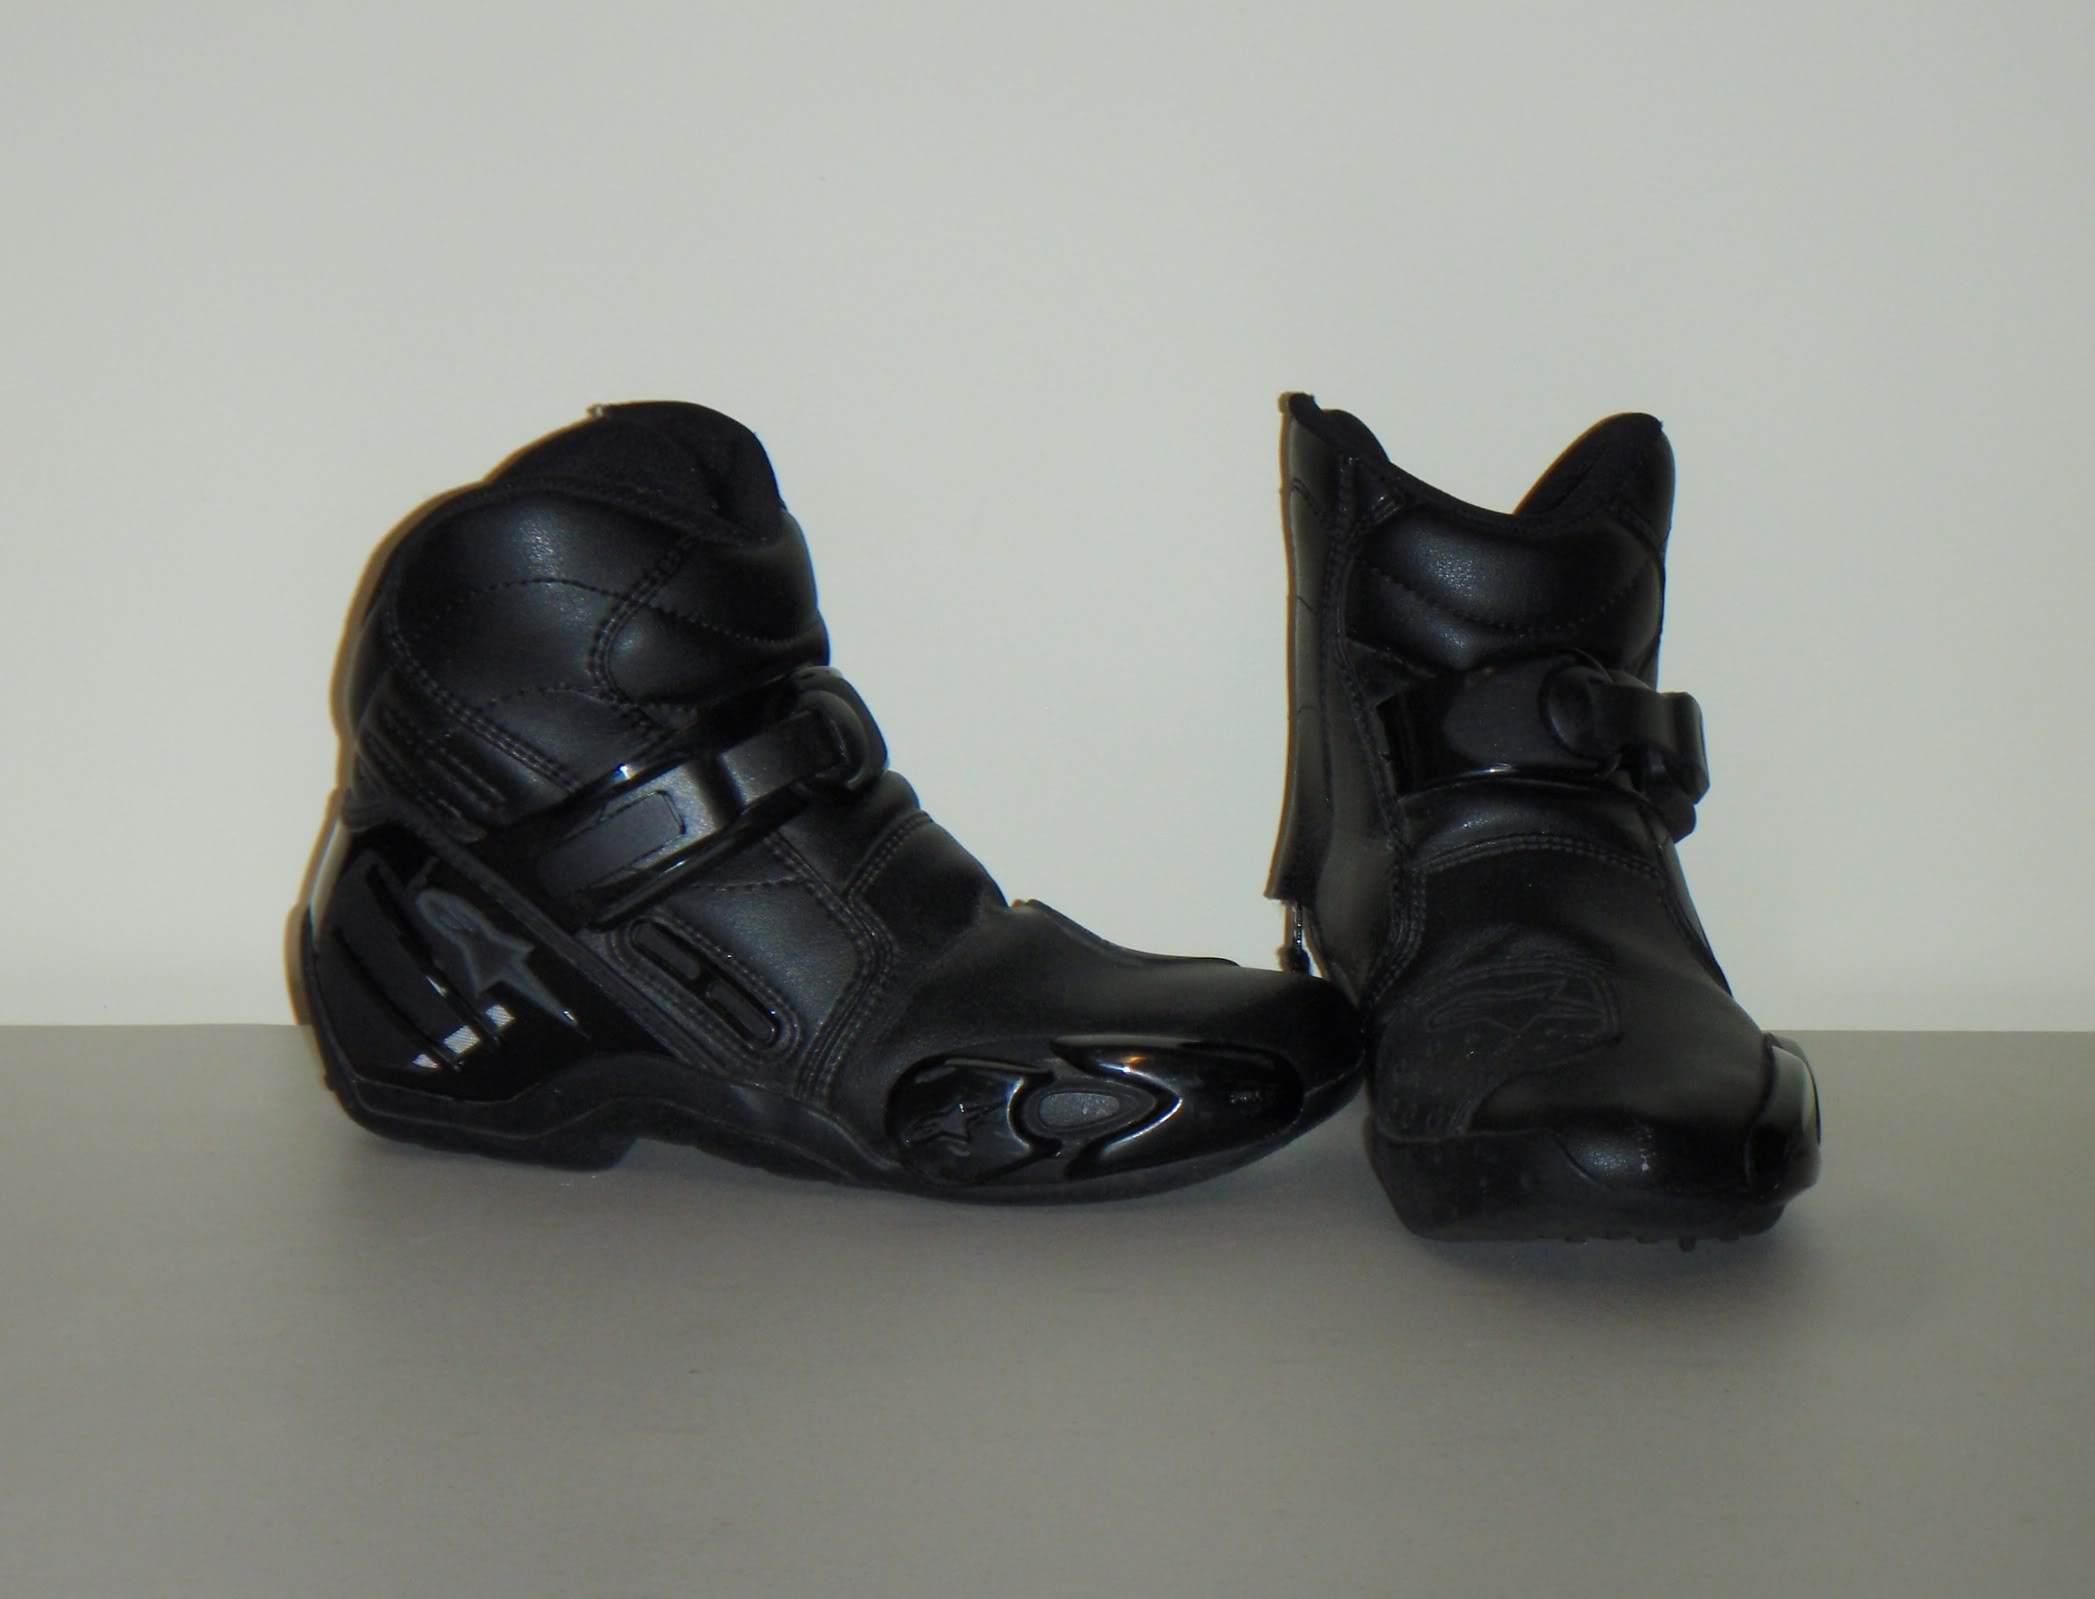 Botas Alpine Start Faster-2 Boots-1